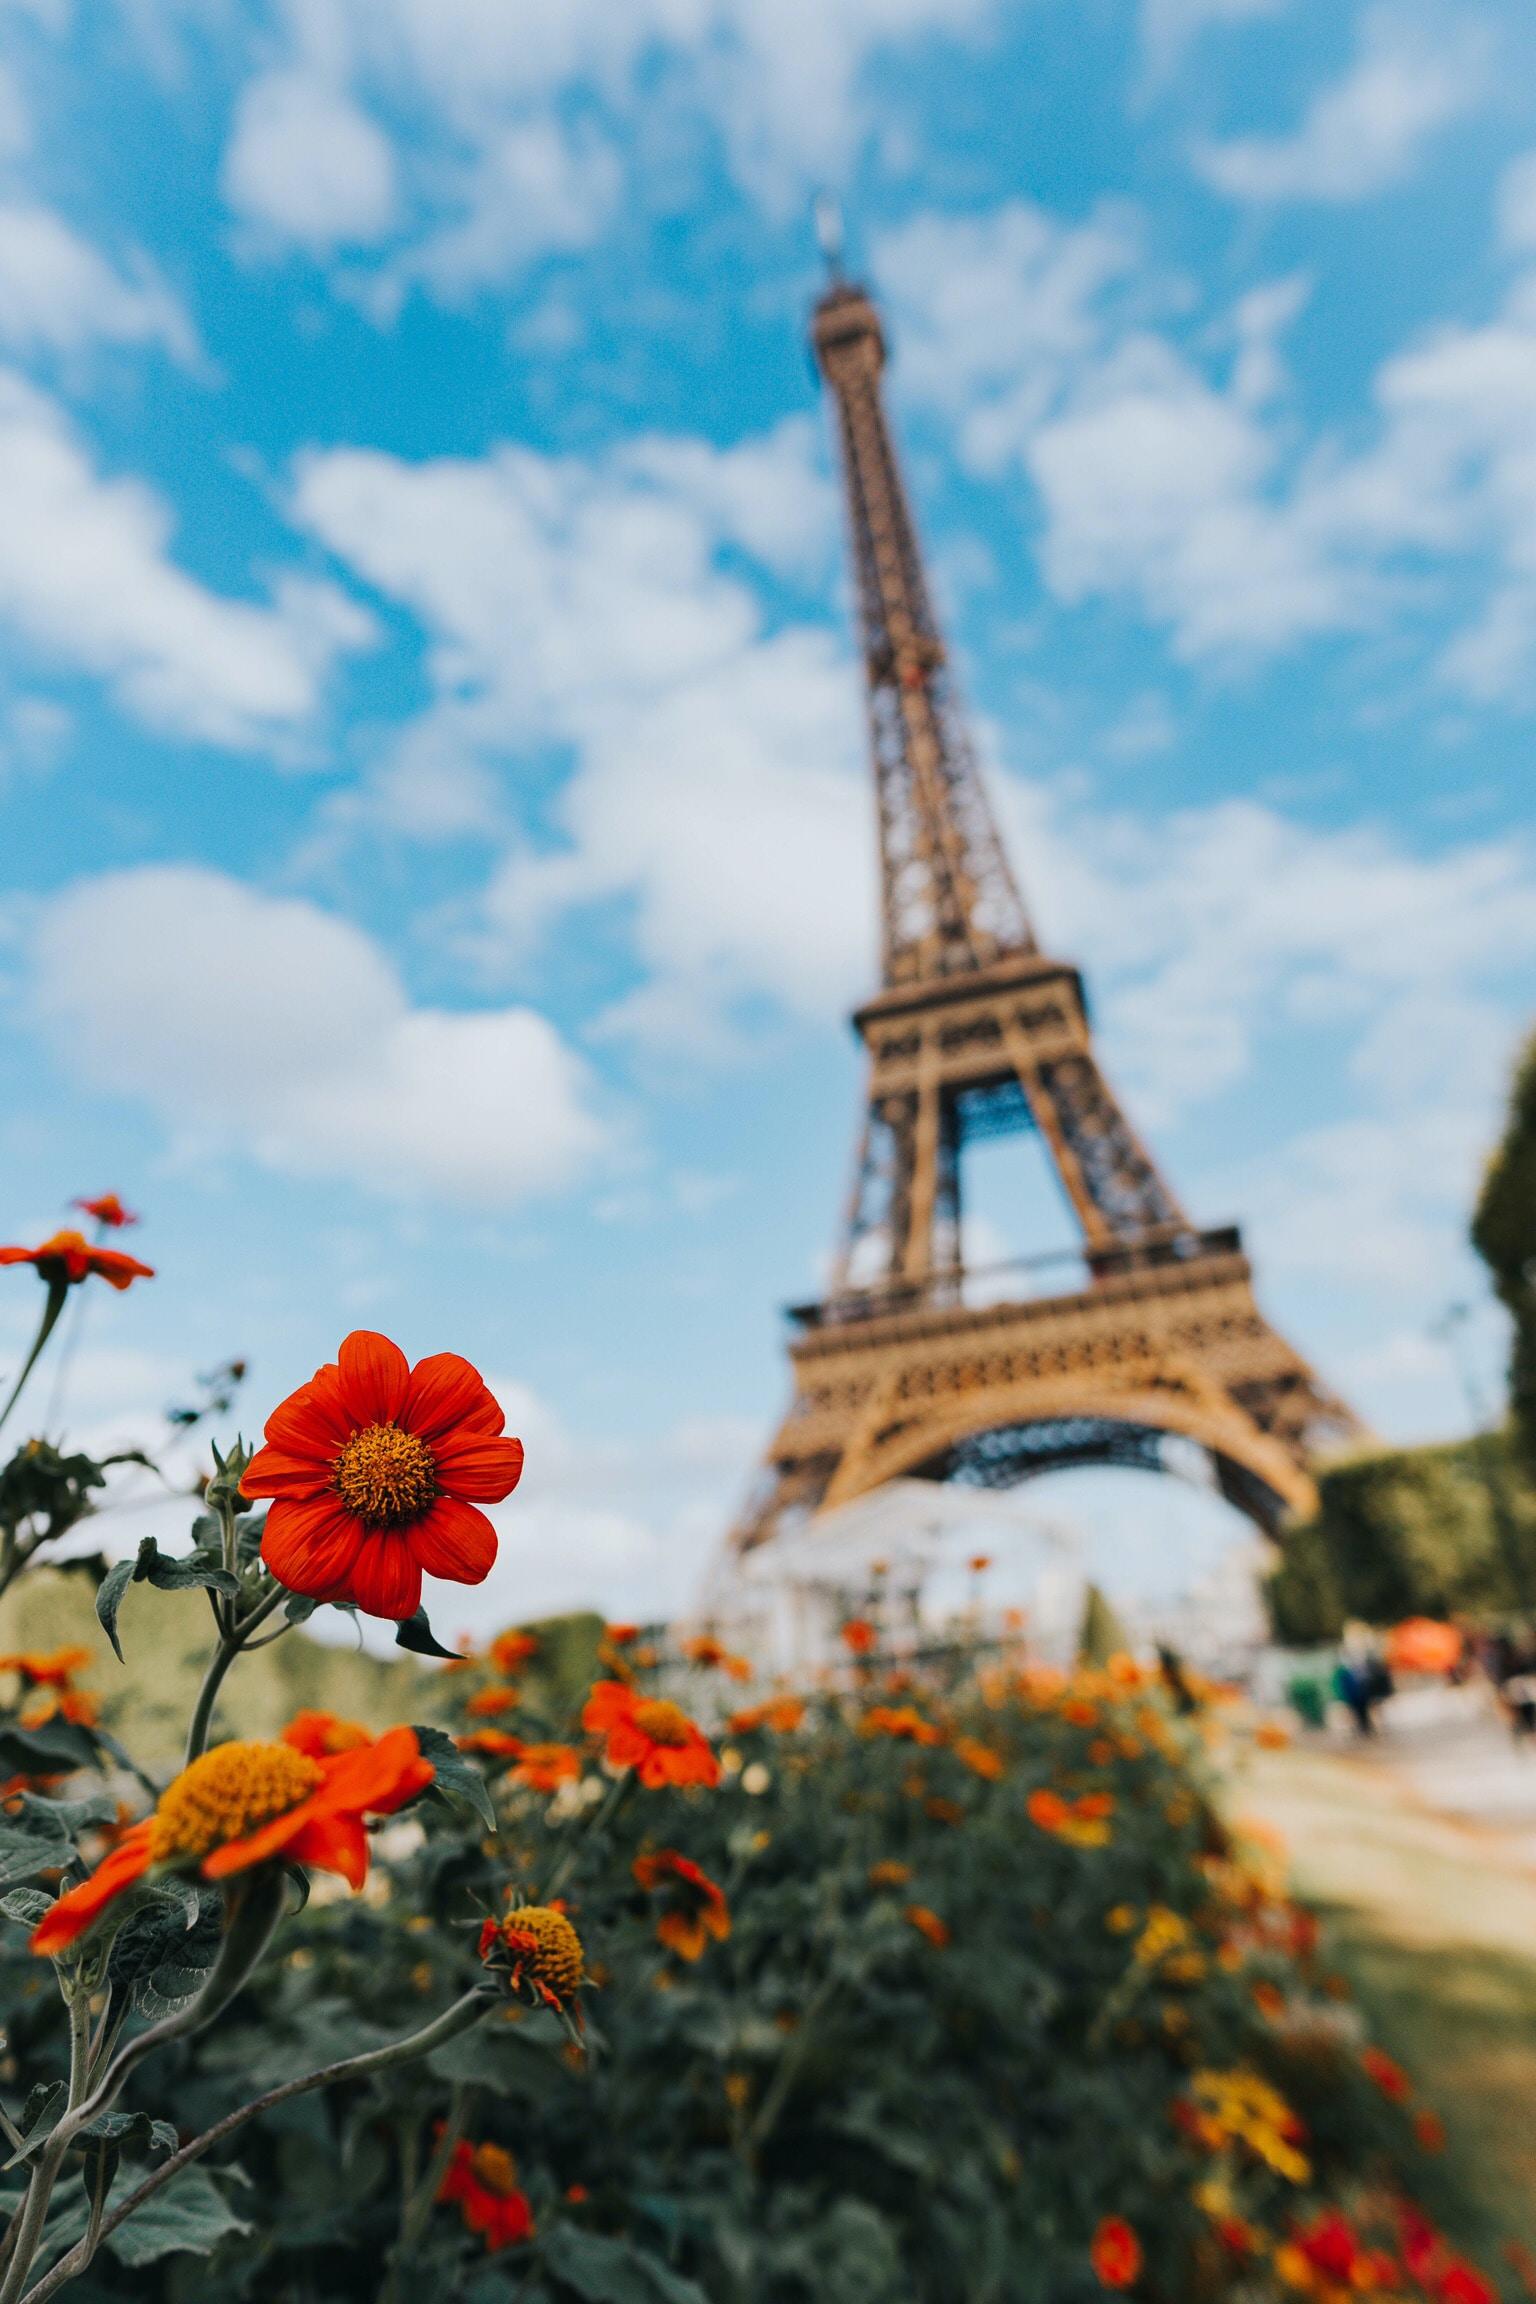 garden of flower near Eiffel Tower